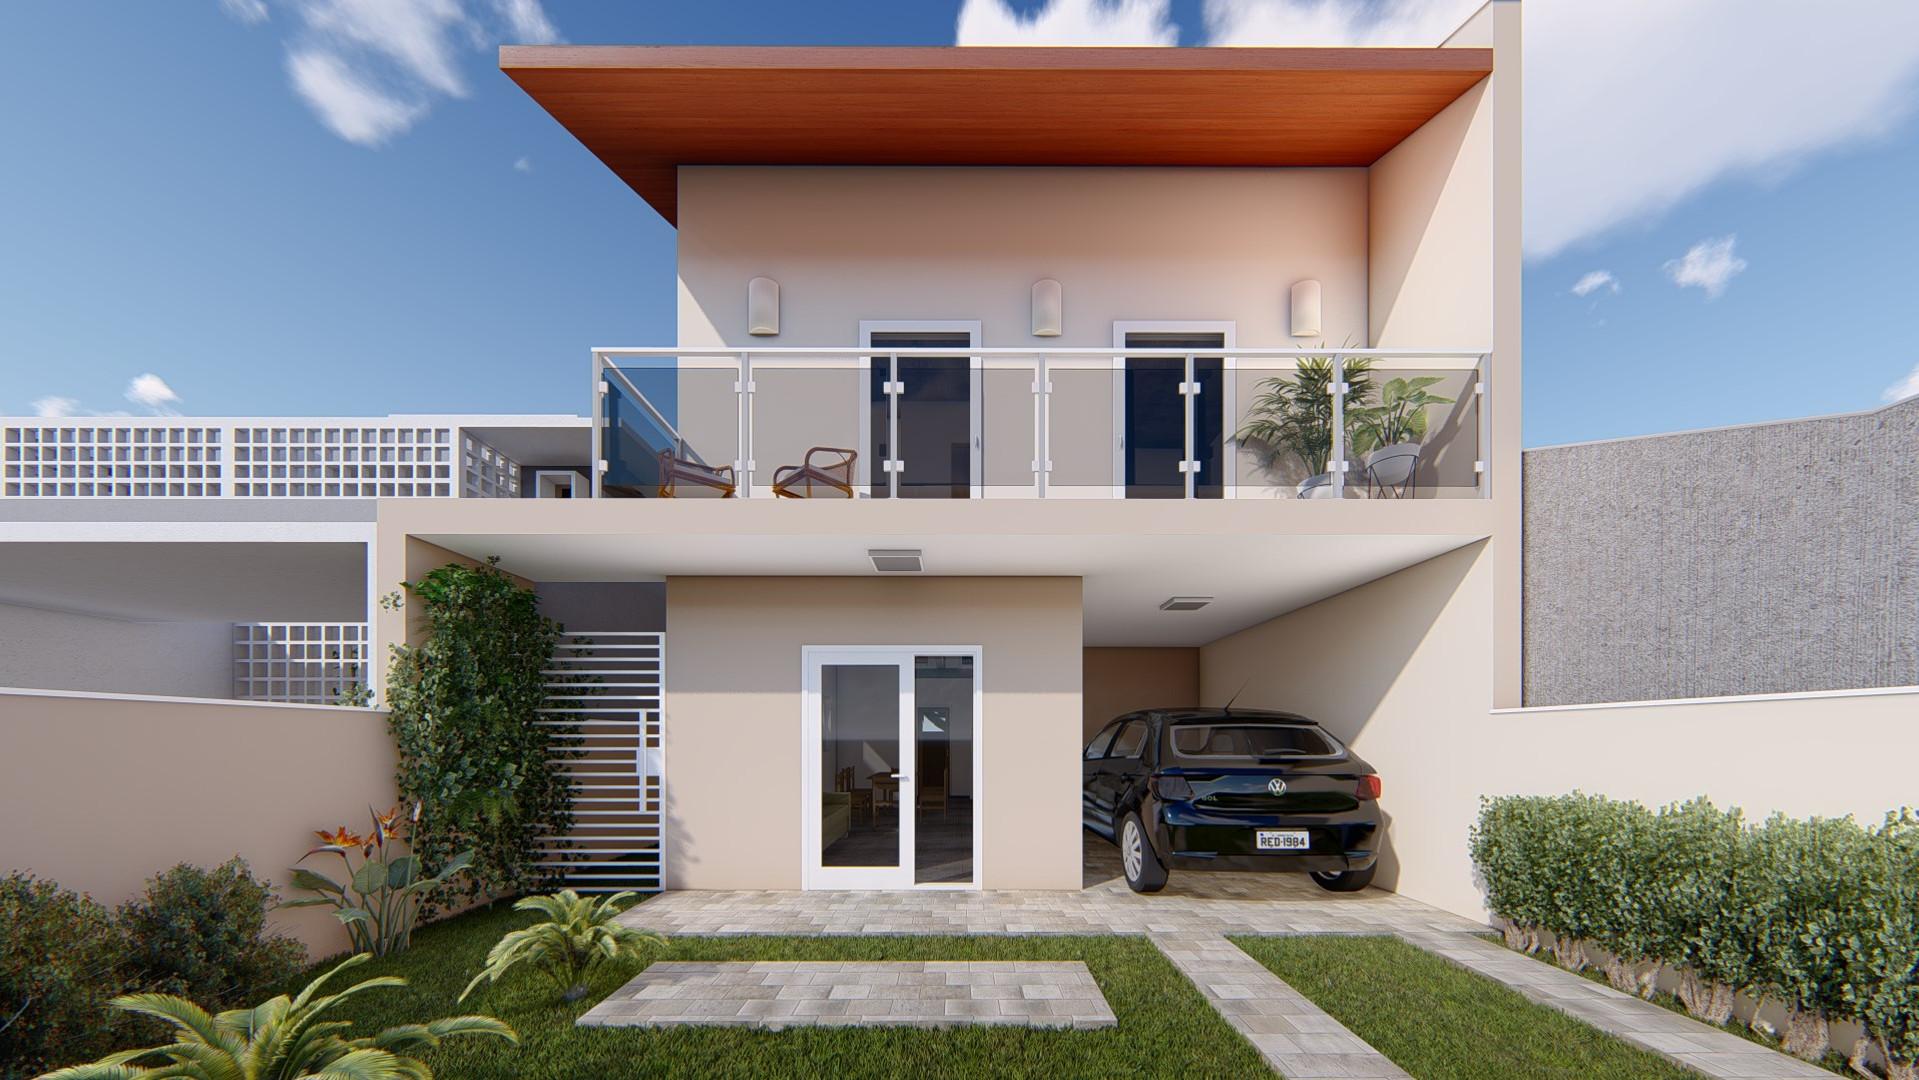 projeto-arquitetonico-3.jpg